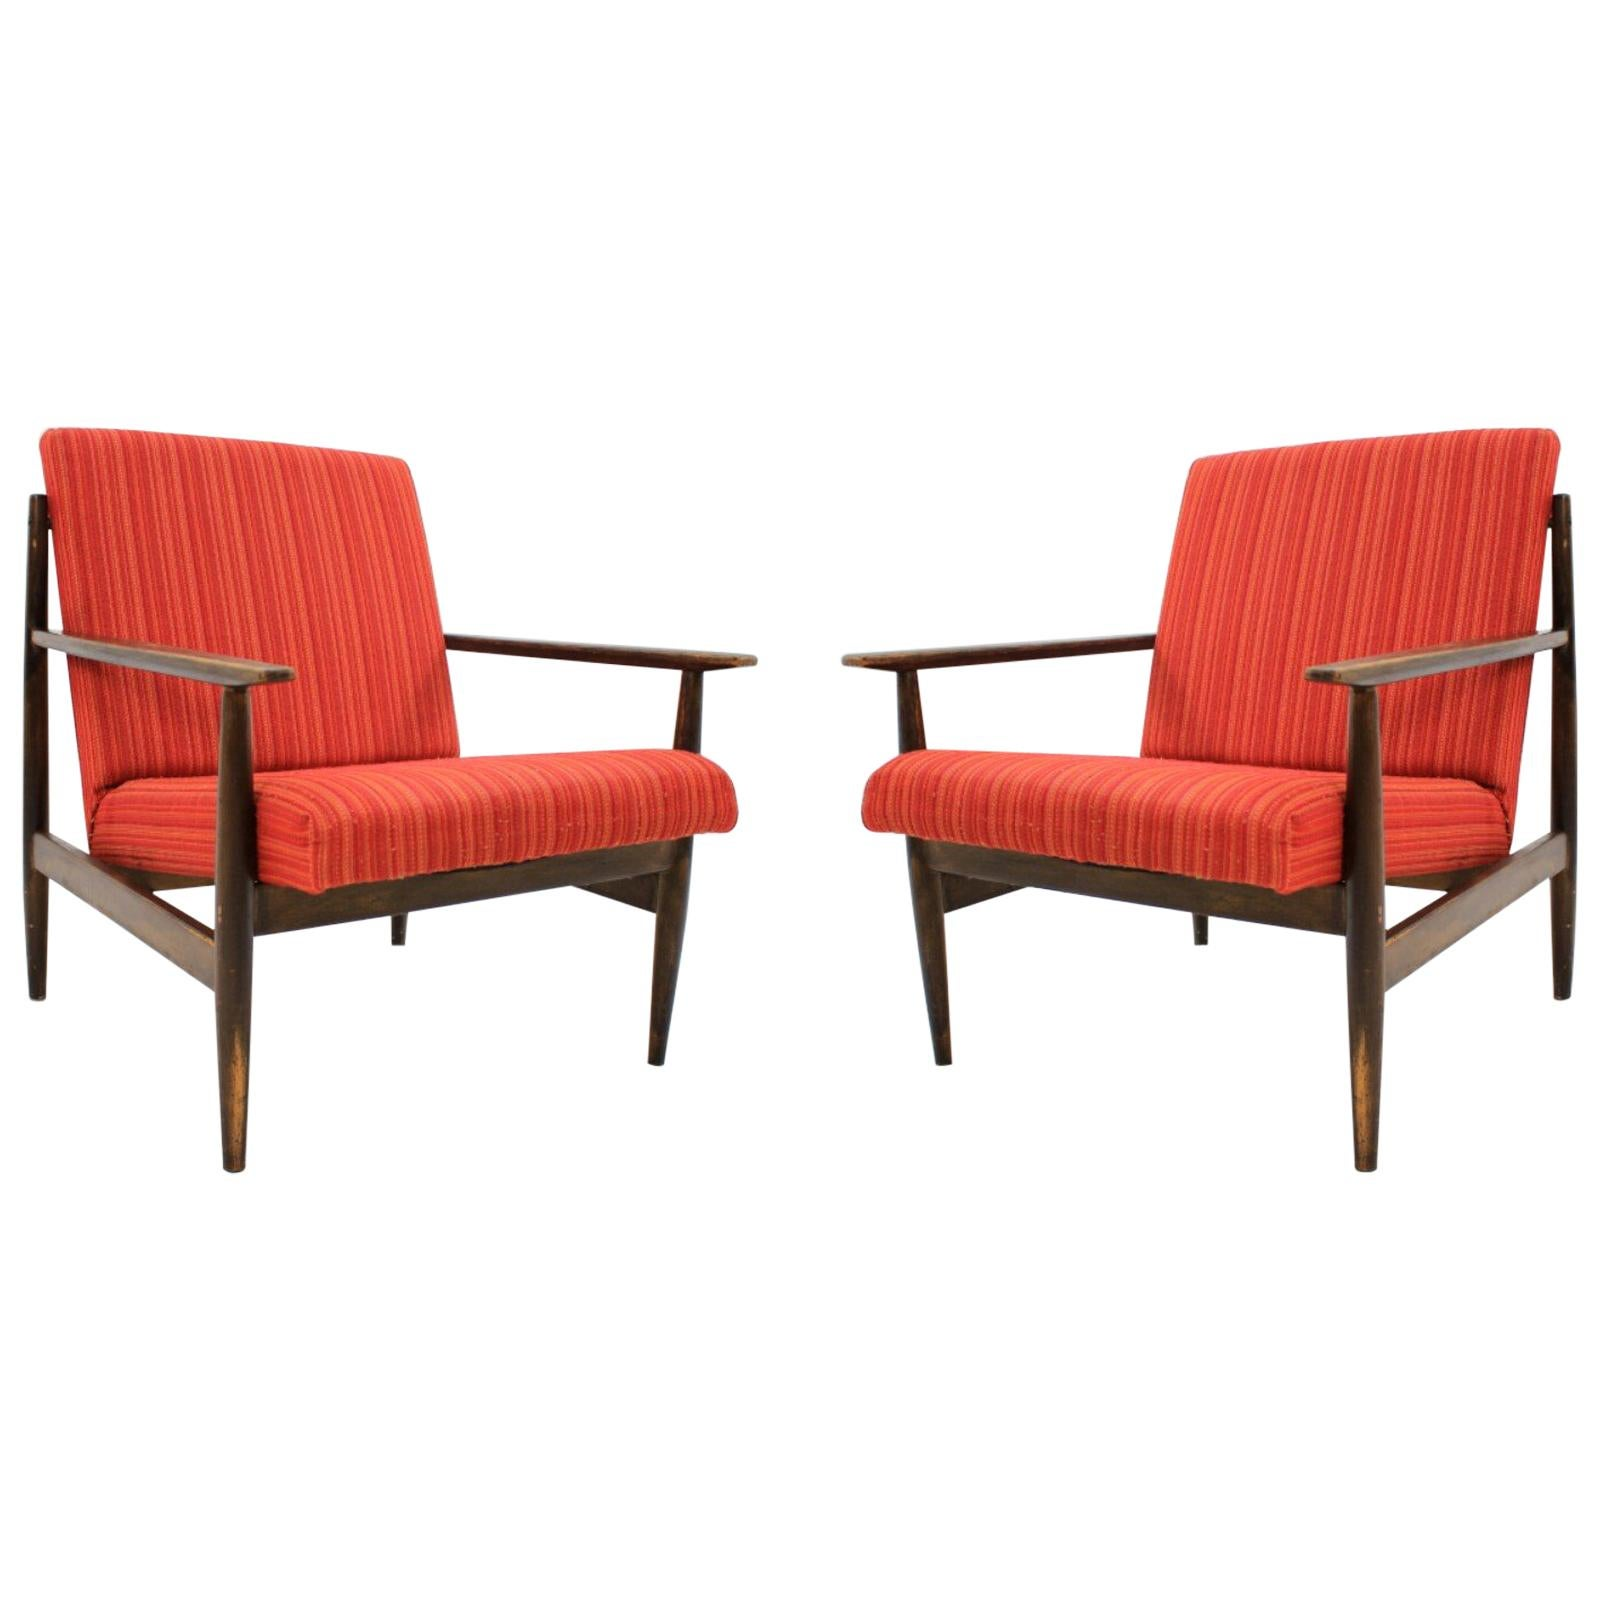 Pair of Midcentury Armchairs, 1970s